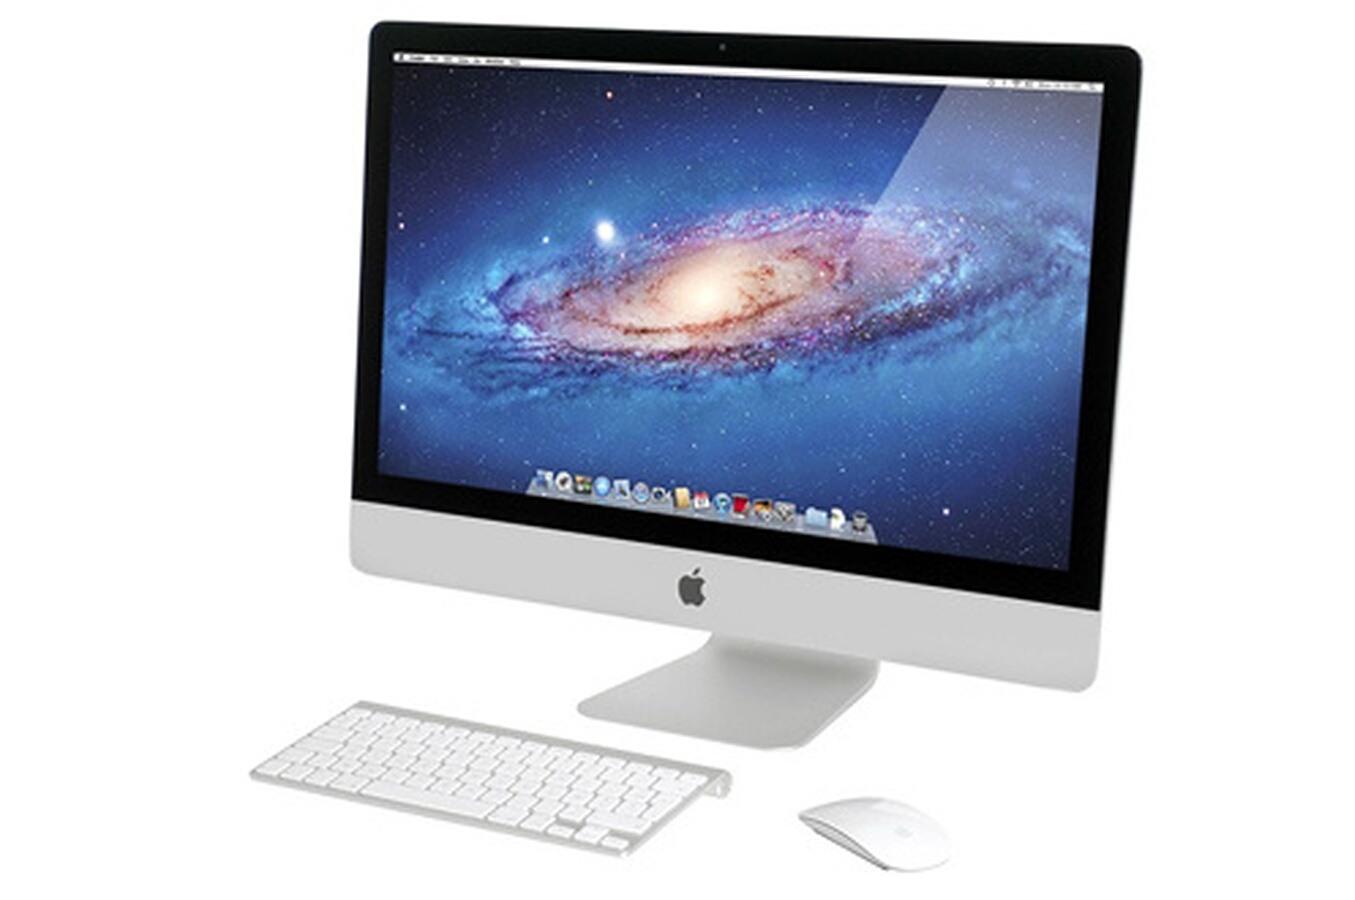 imac apple imac me087f a imacme087f a 3785009 darty. Black Bedroom Furniture Sets. Home Design Ideas